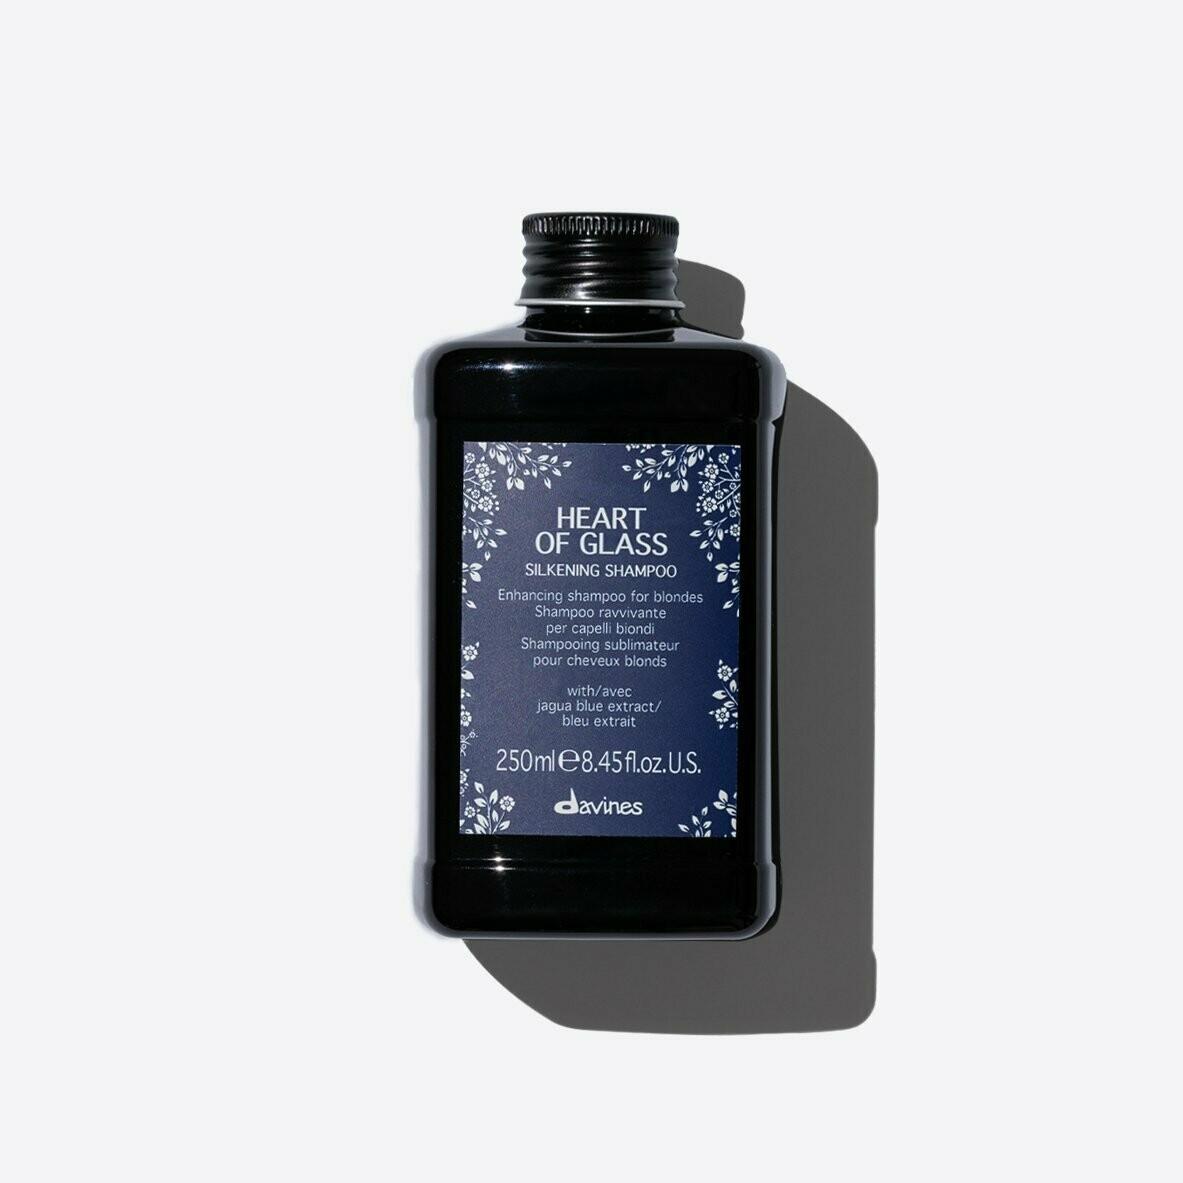 Silkening Shampoo 250 ml